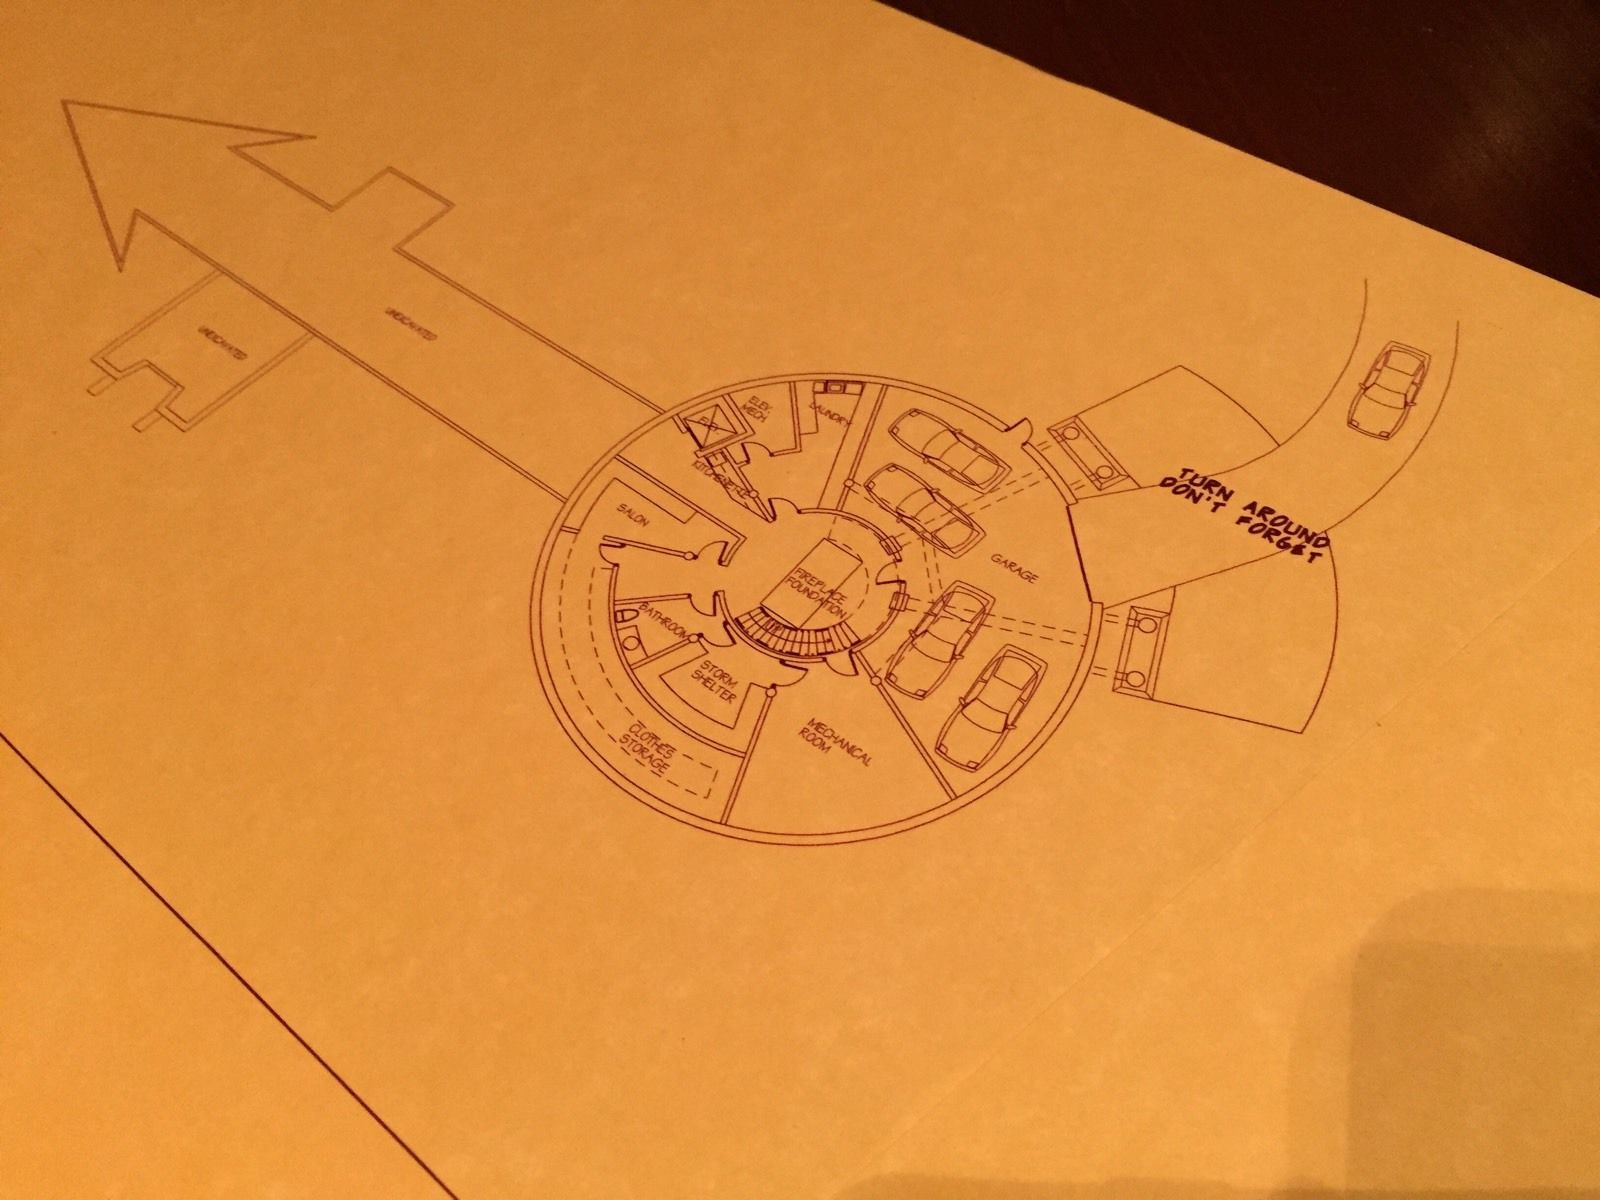 Purple Prince Secret O Symbol House Floor Plans 6 Set V Very Rare Prince Paisley Park Prince And Mayte Paisley Park